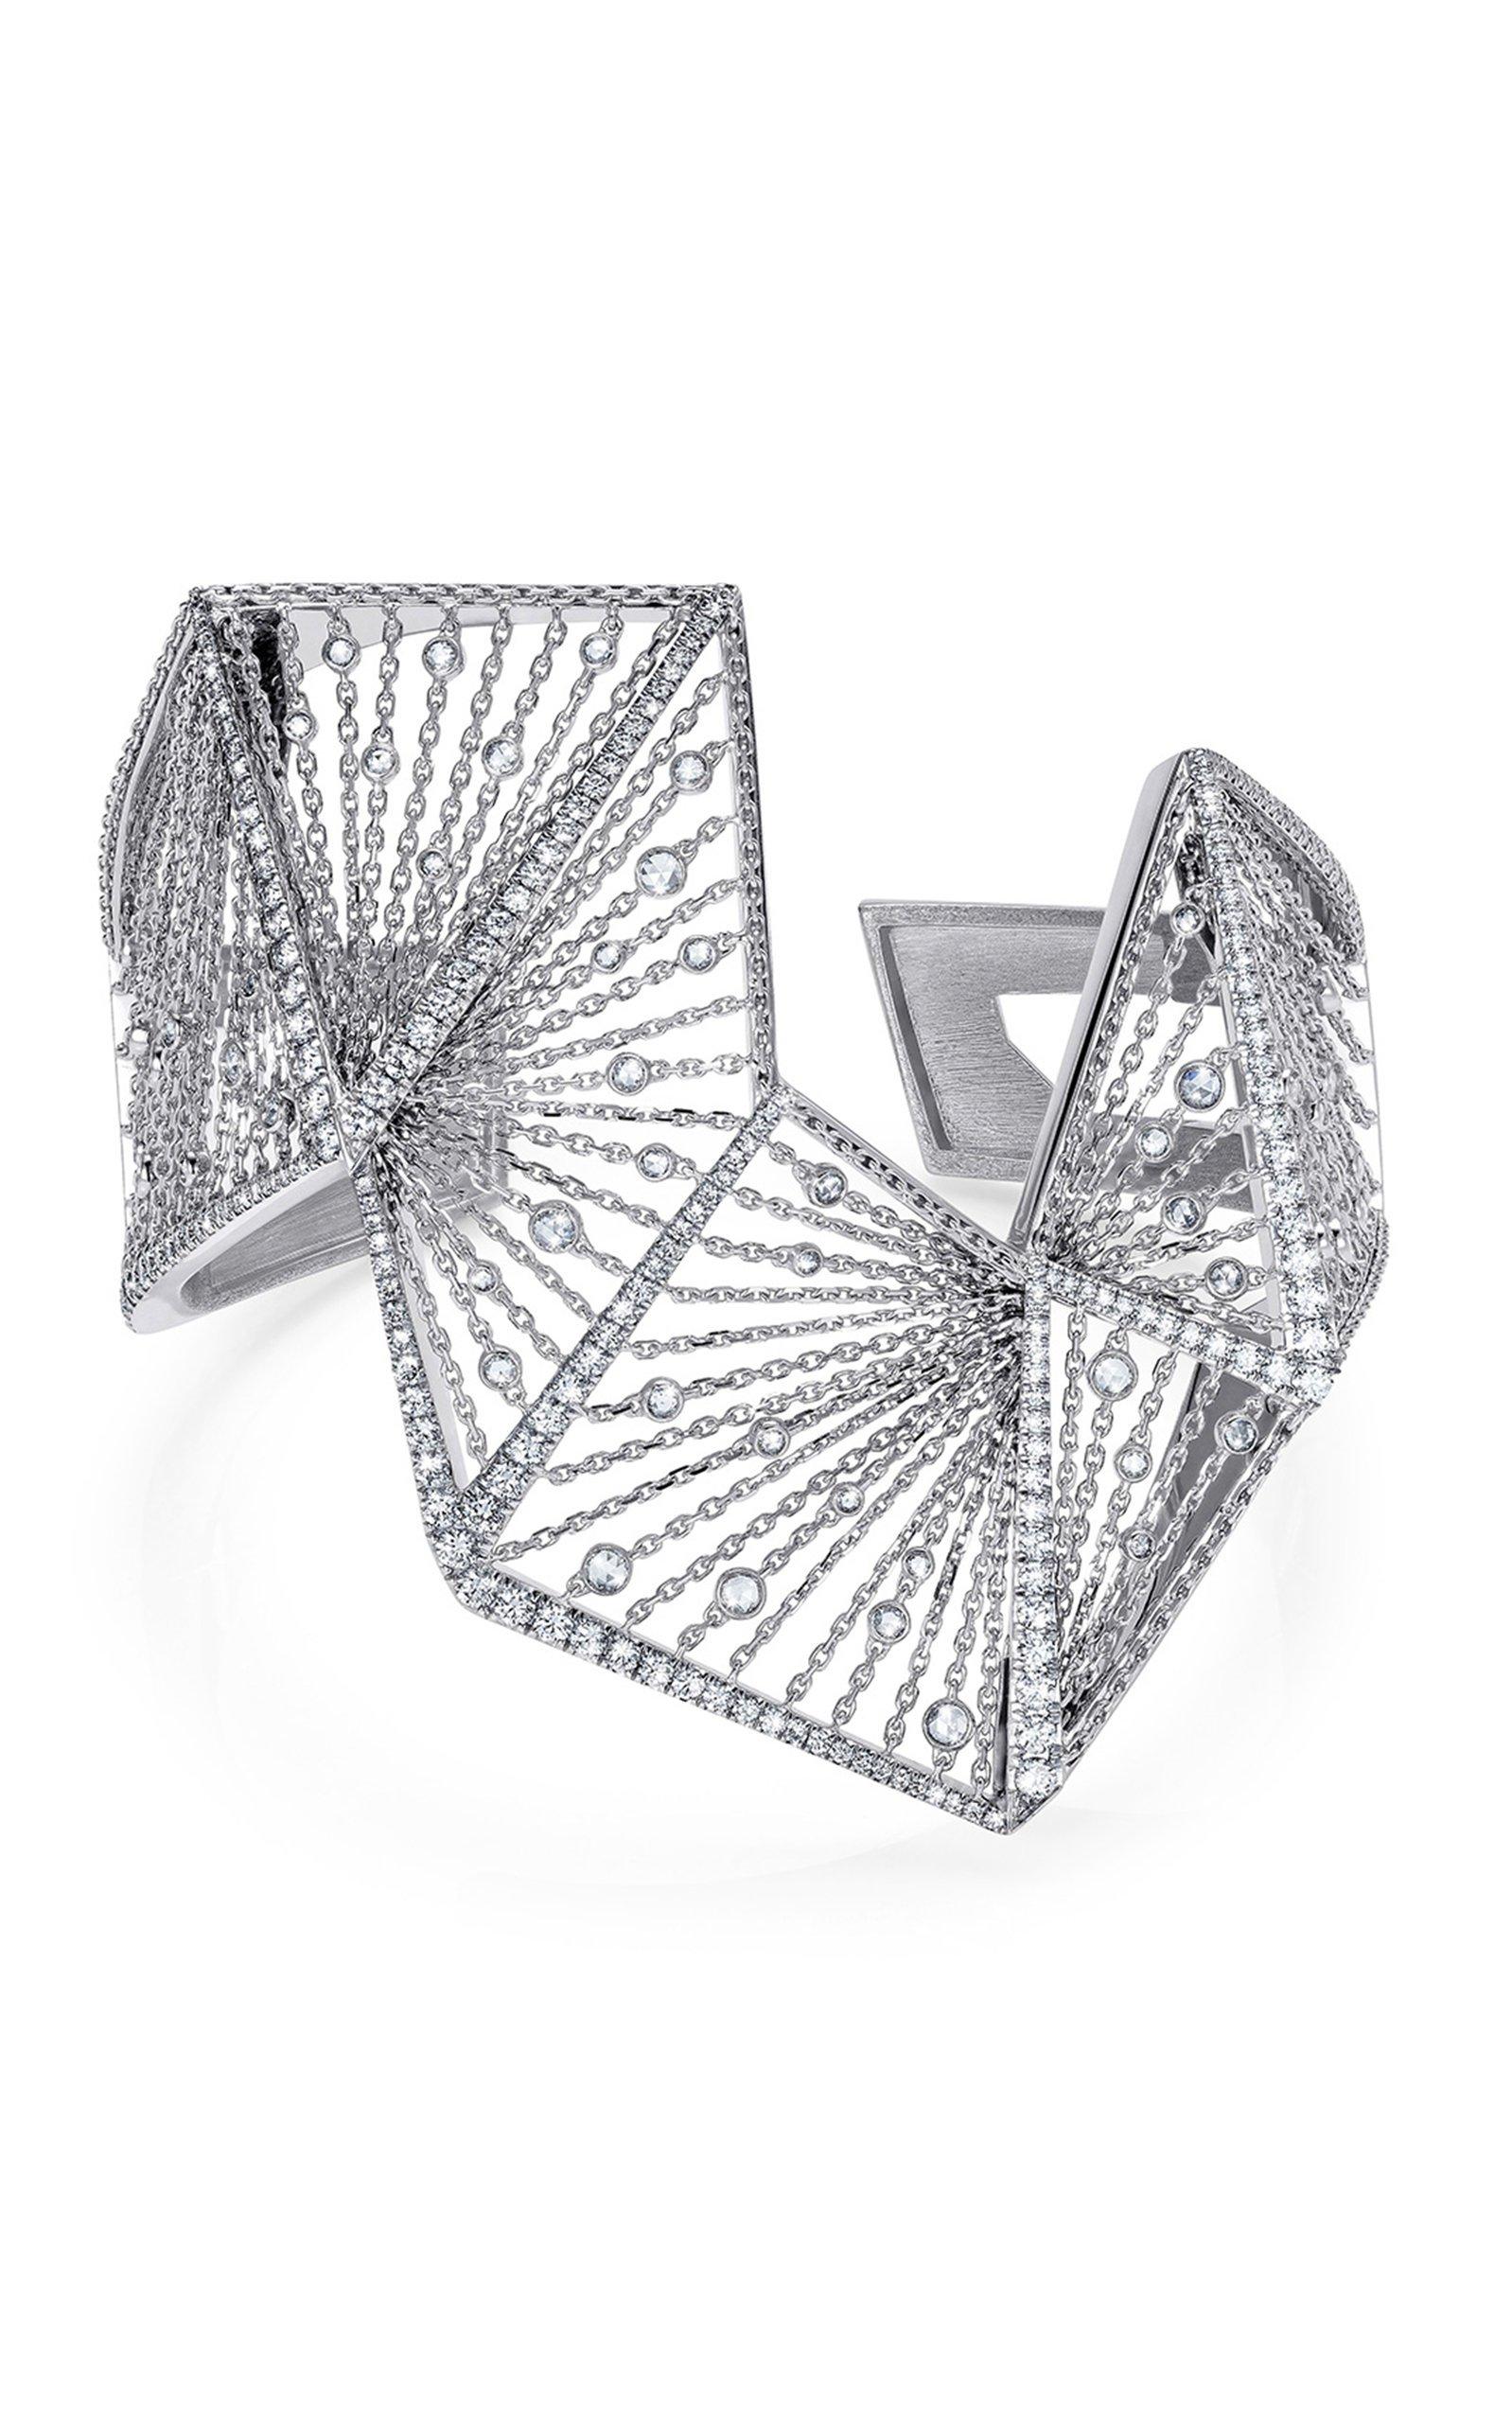 White Gold and White Diamond Angular Bracelet by Mike Joseph | Moda Operandi